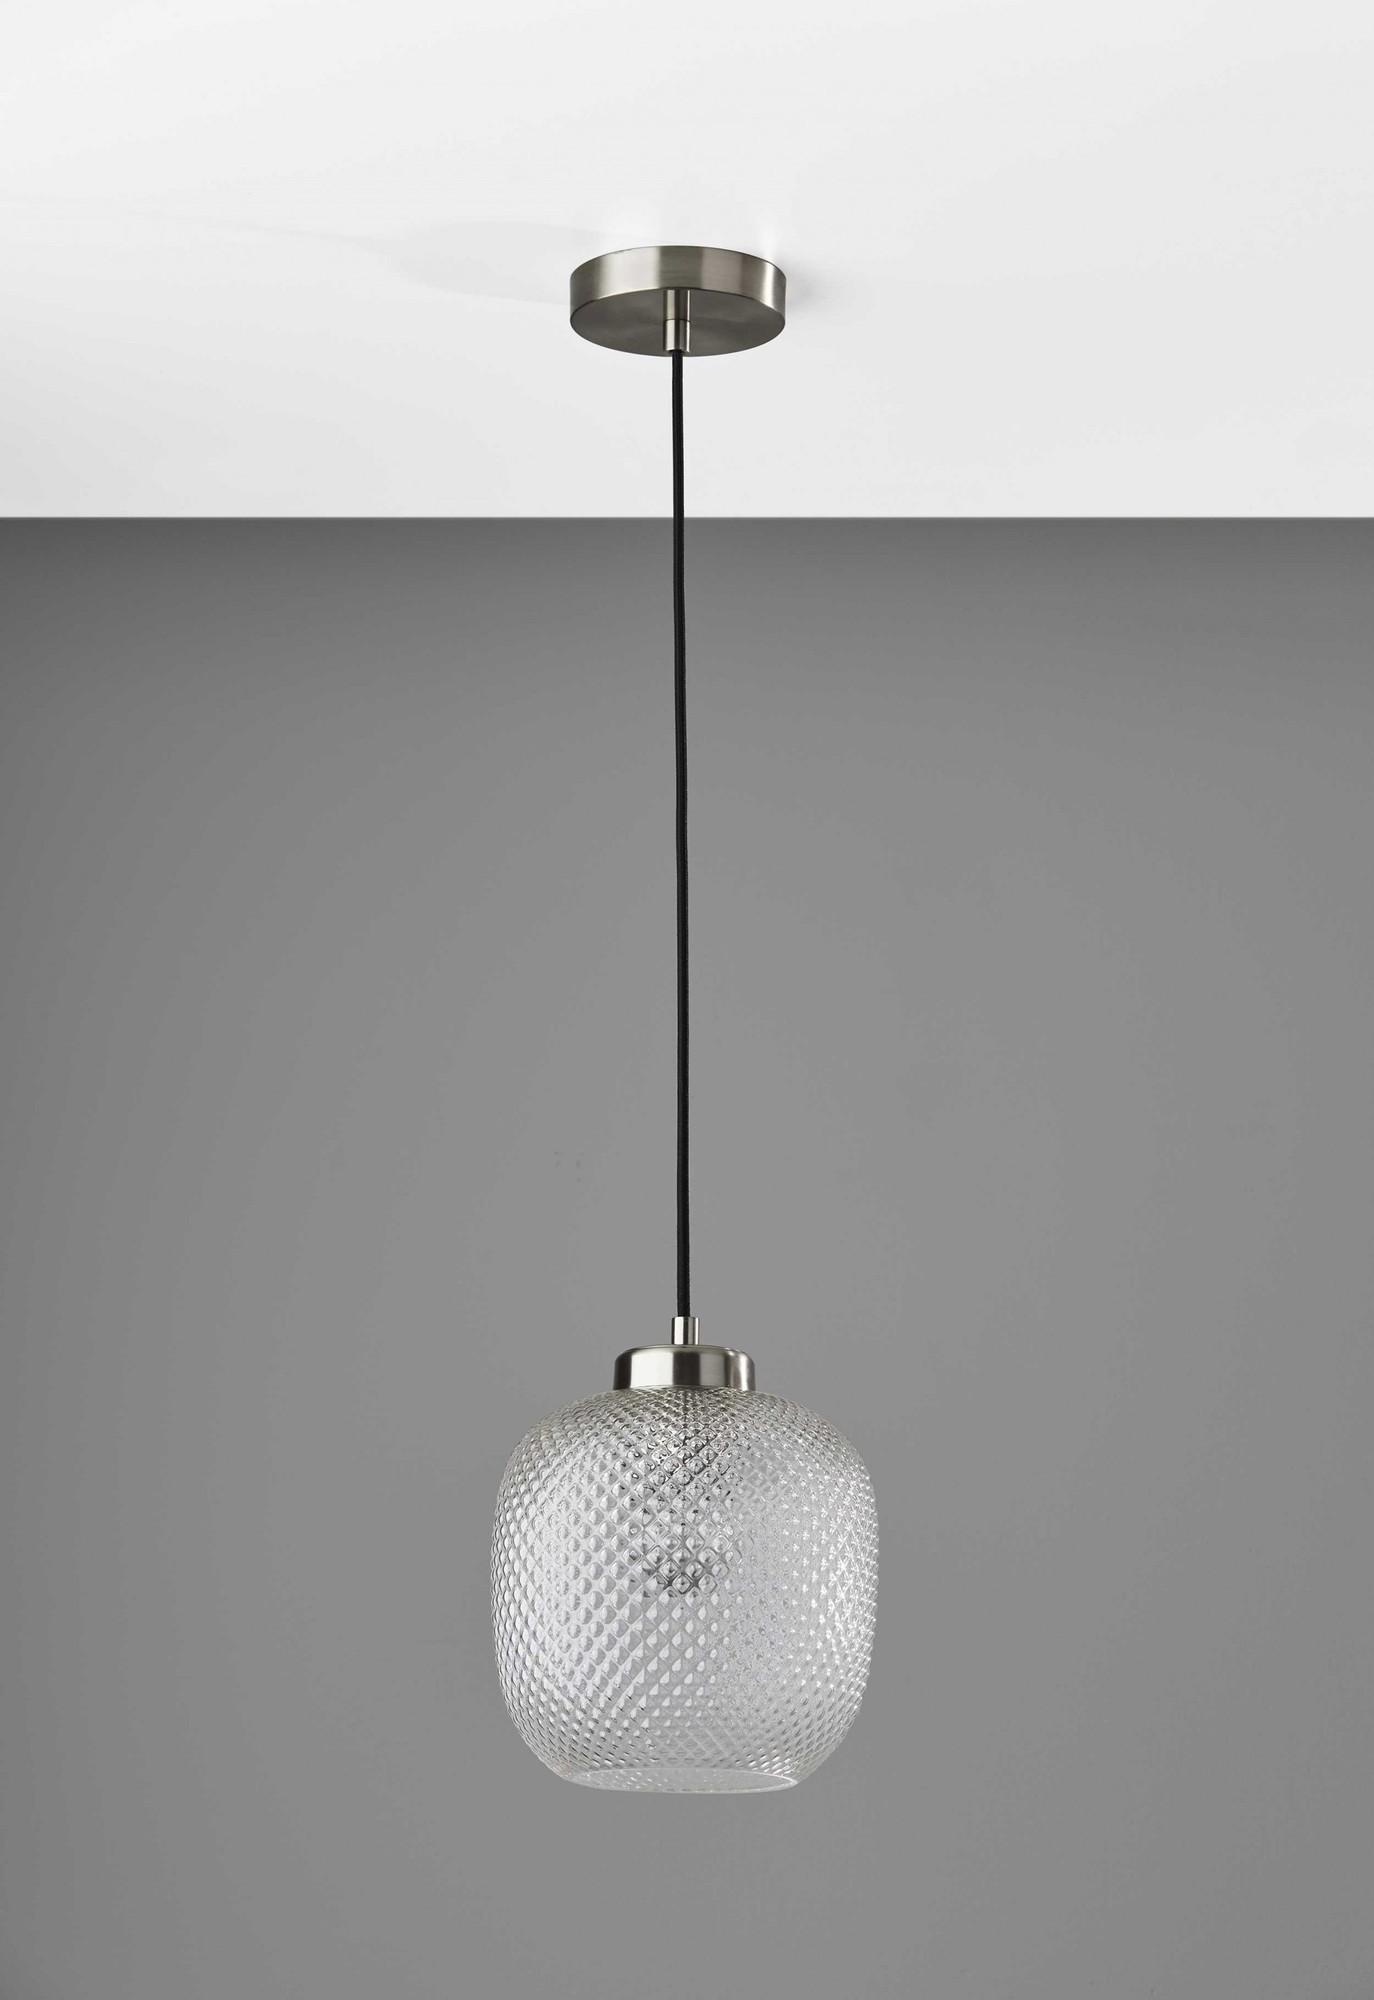 "8.625"" X 8.625"" X 10.5"" Brushed steel Glass Metal Pendant"